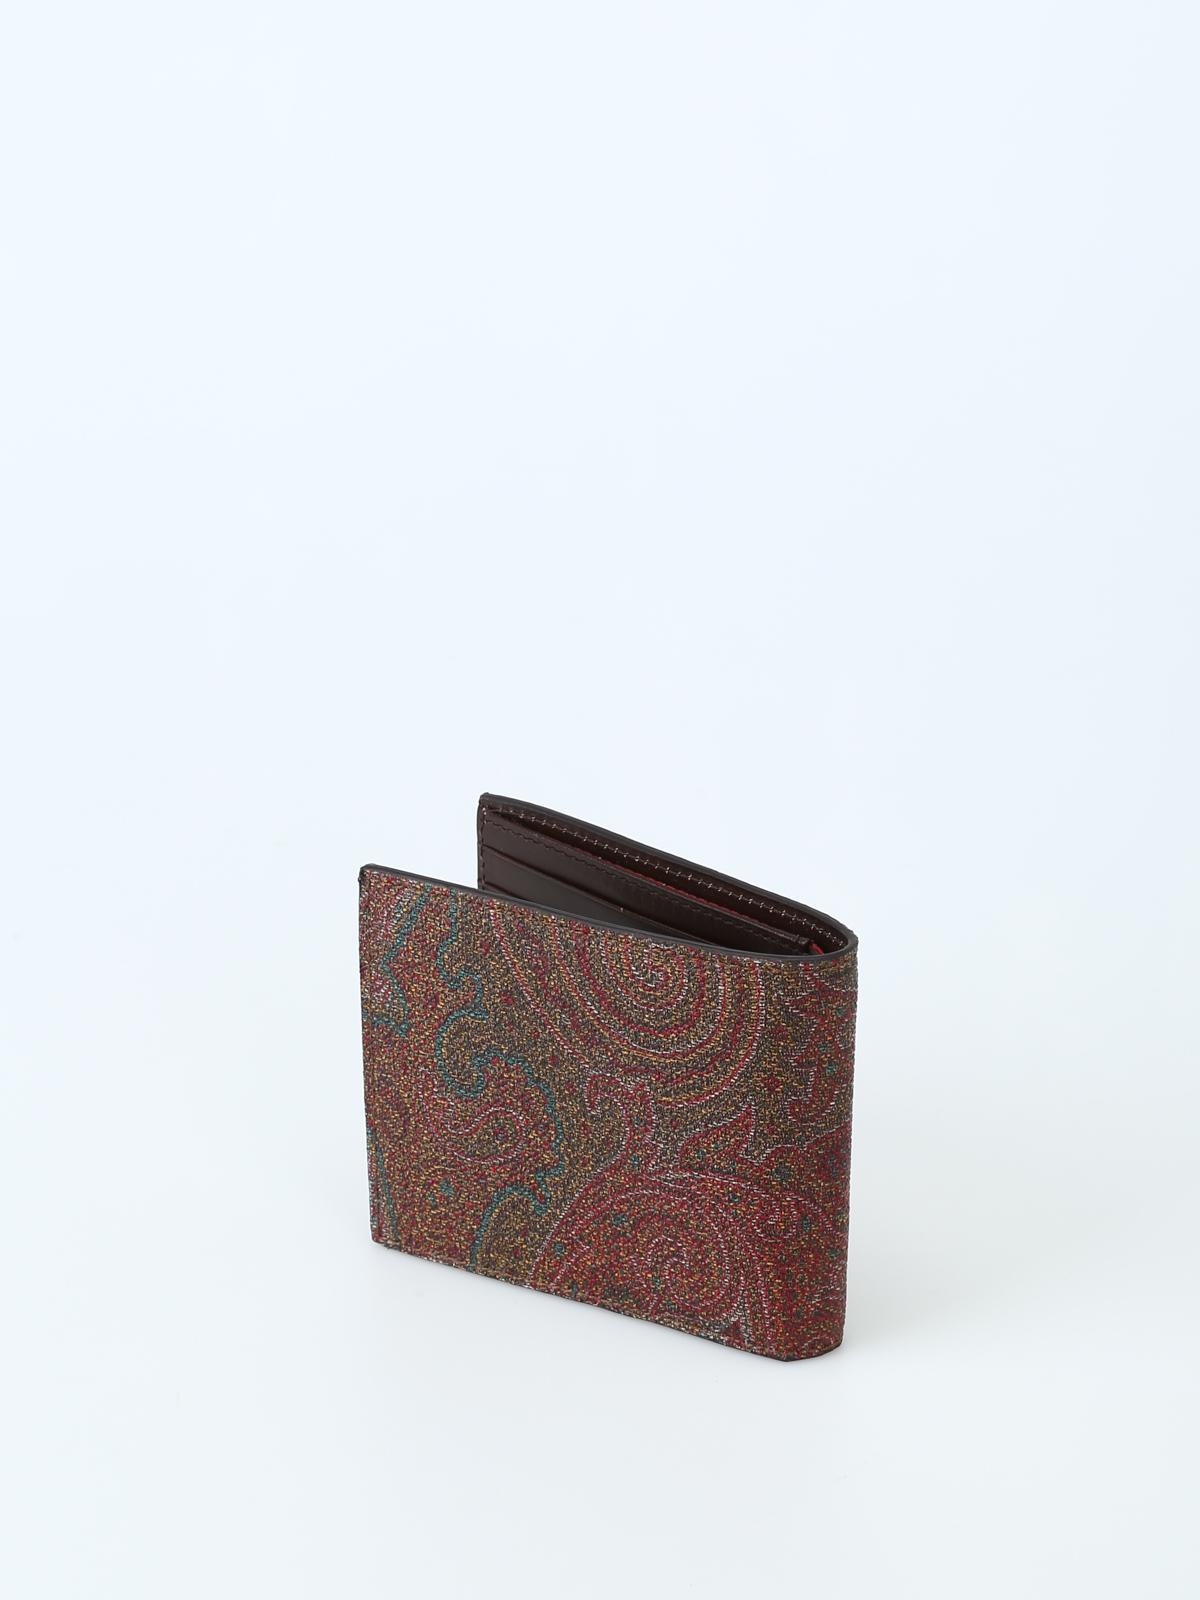 857258bb76 iKRIX ETRO: portafogli - Portafoglio marrone in tessuto paisley